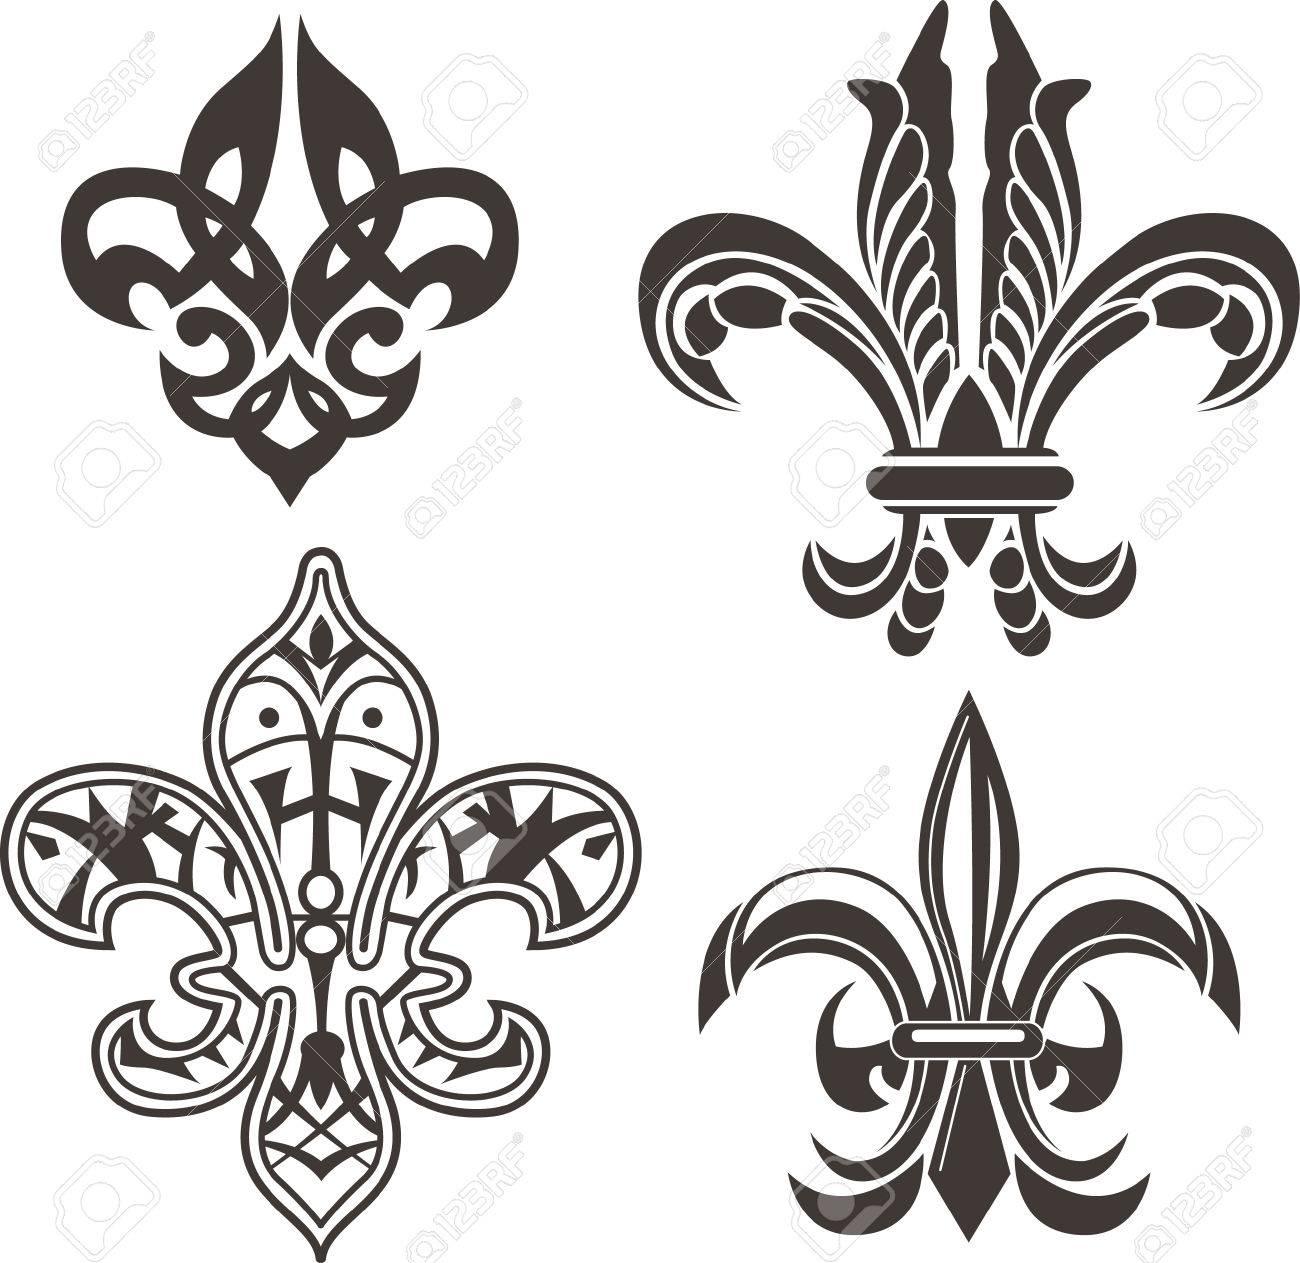 Classic fleur de lis symbol royalty free cliparts vectors and classic fleur de lis symbol stock vector 6670311 biocorpaavc